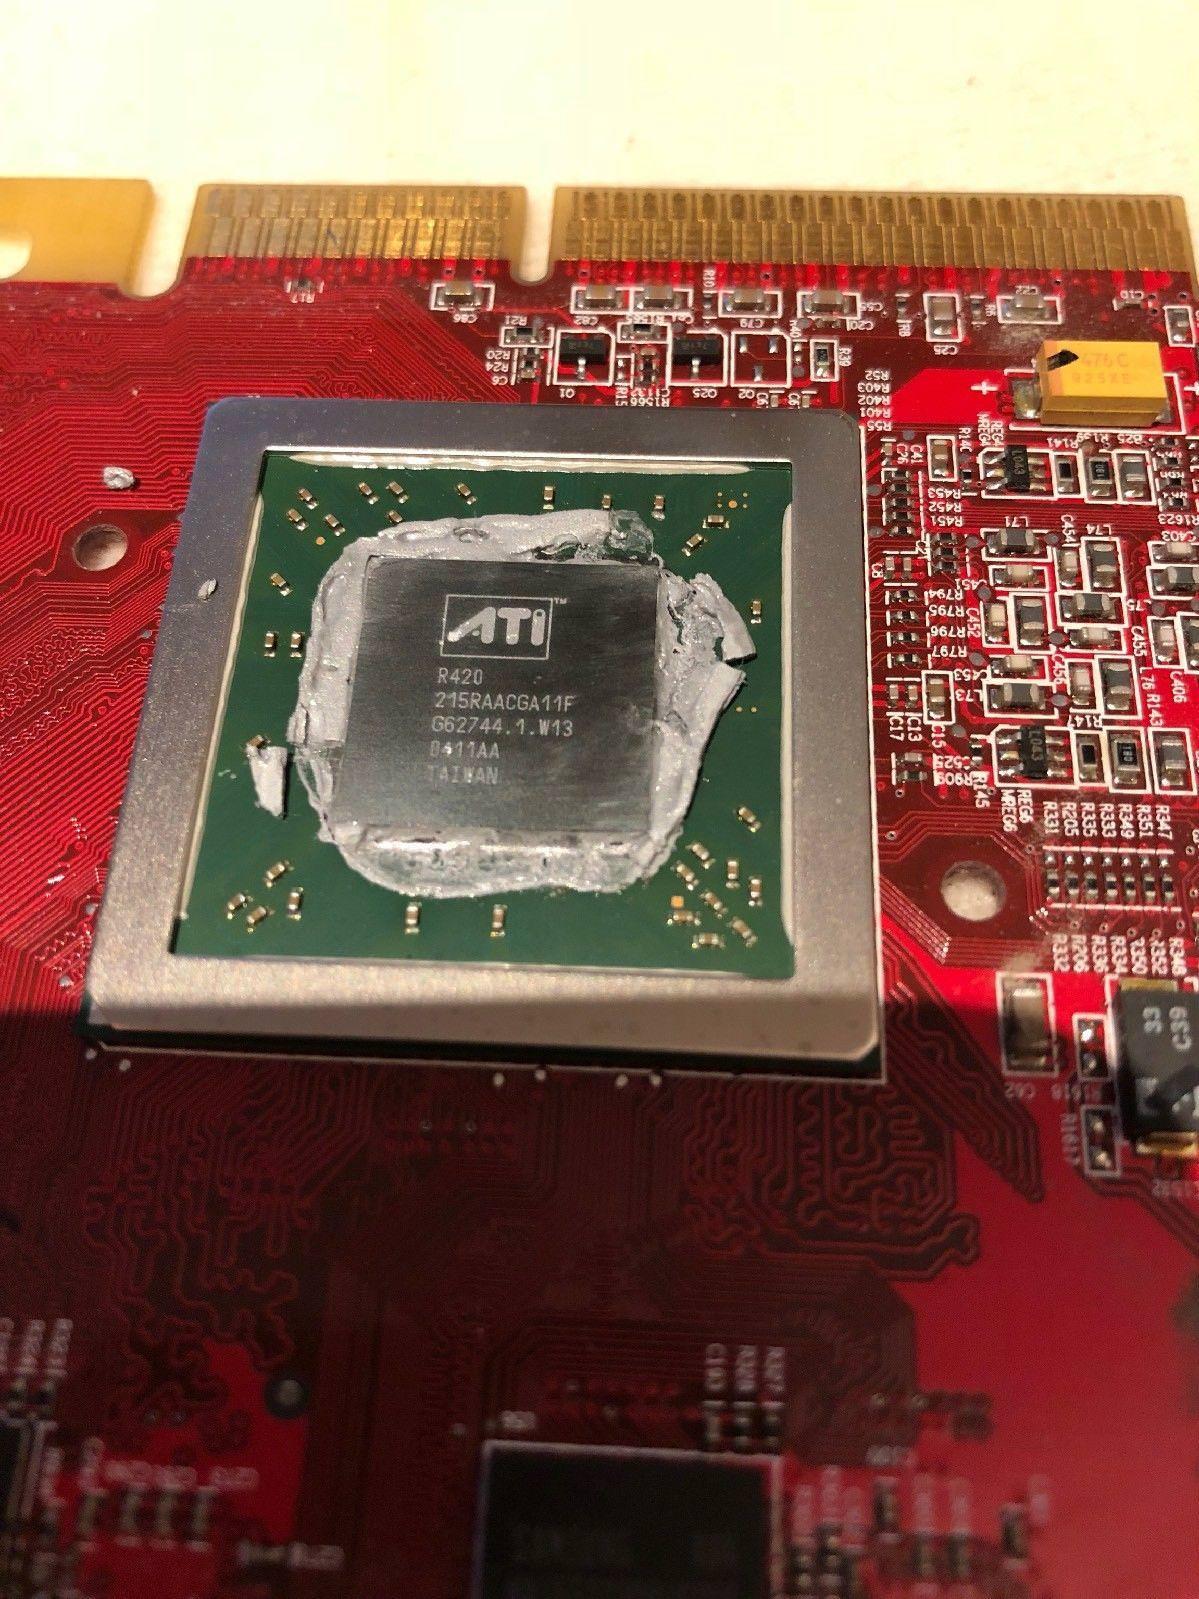 Rare GPUs / Unreleased GPUs | Page 17 | TechPowerUp Forums